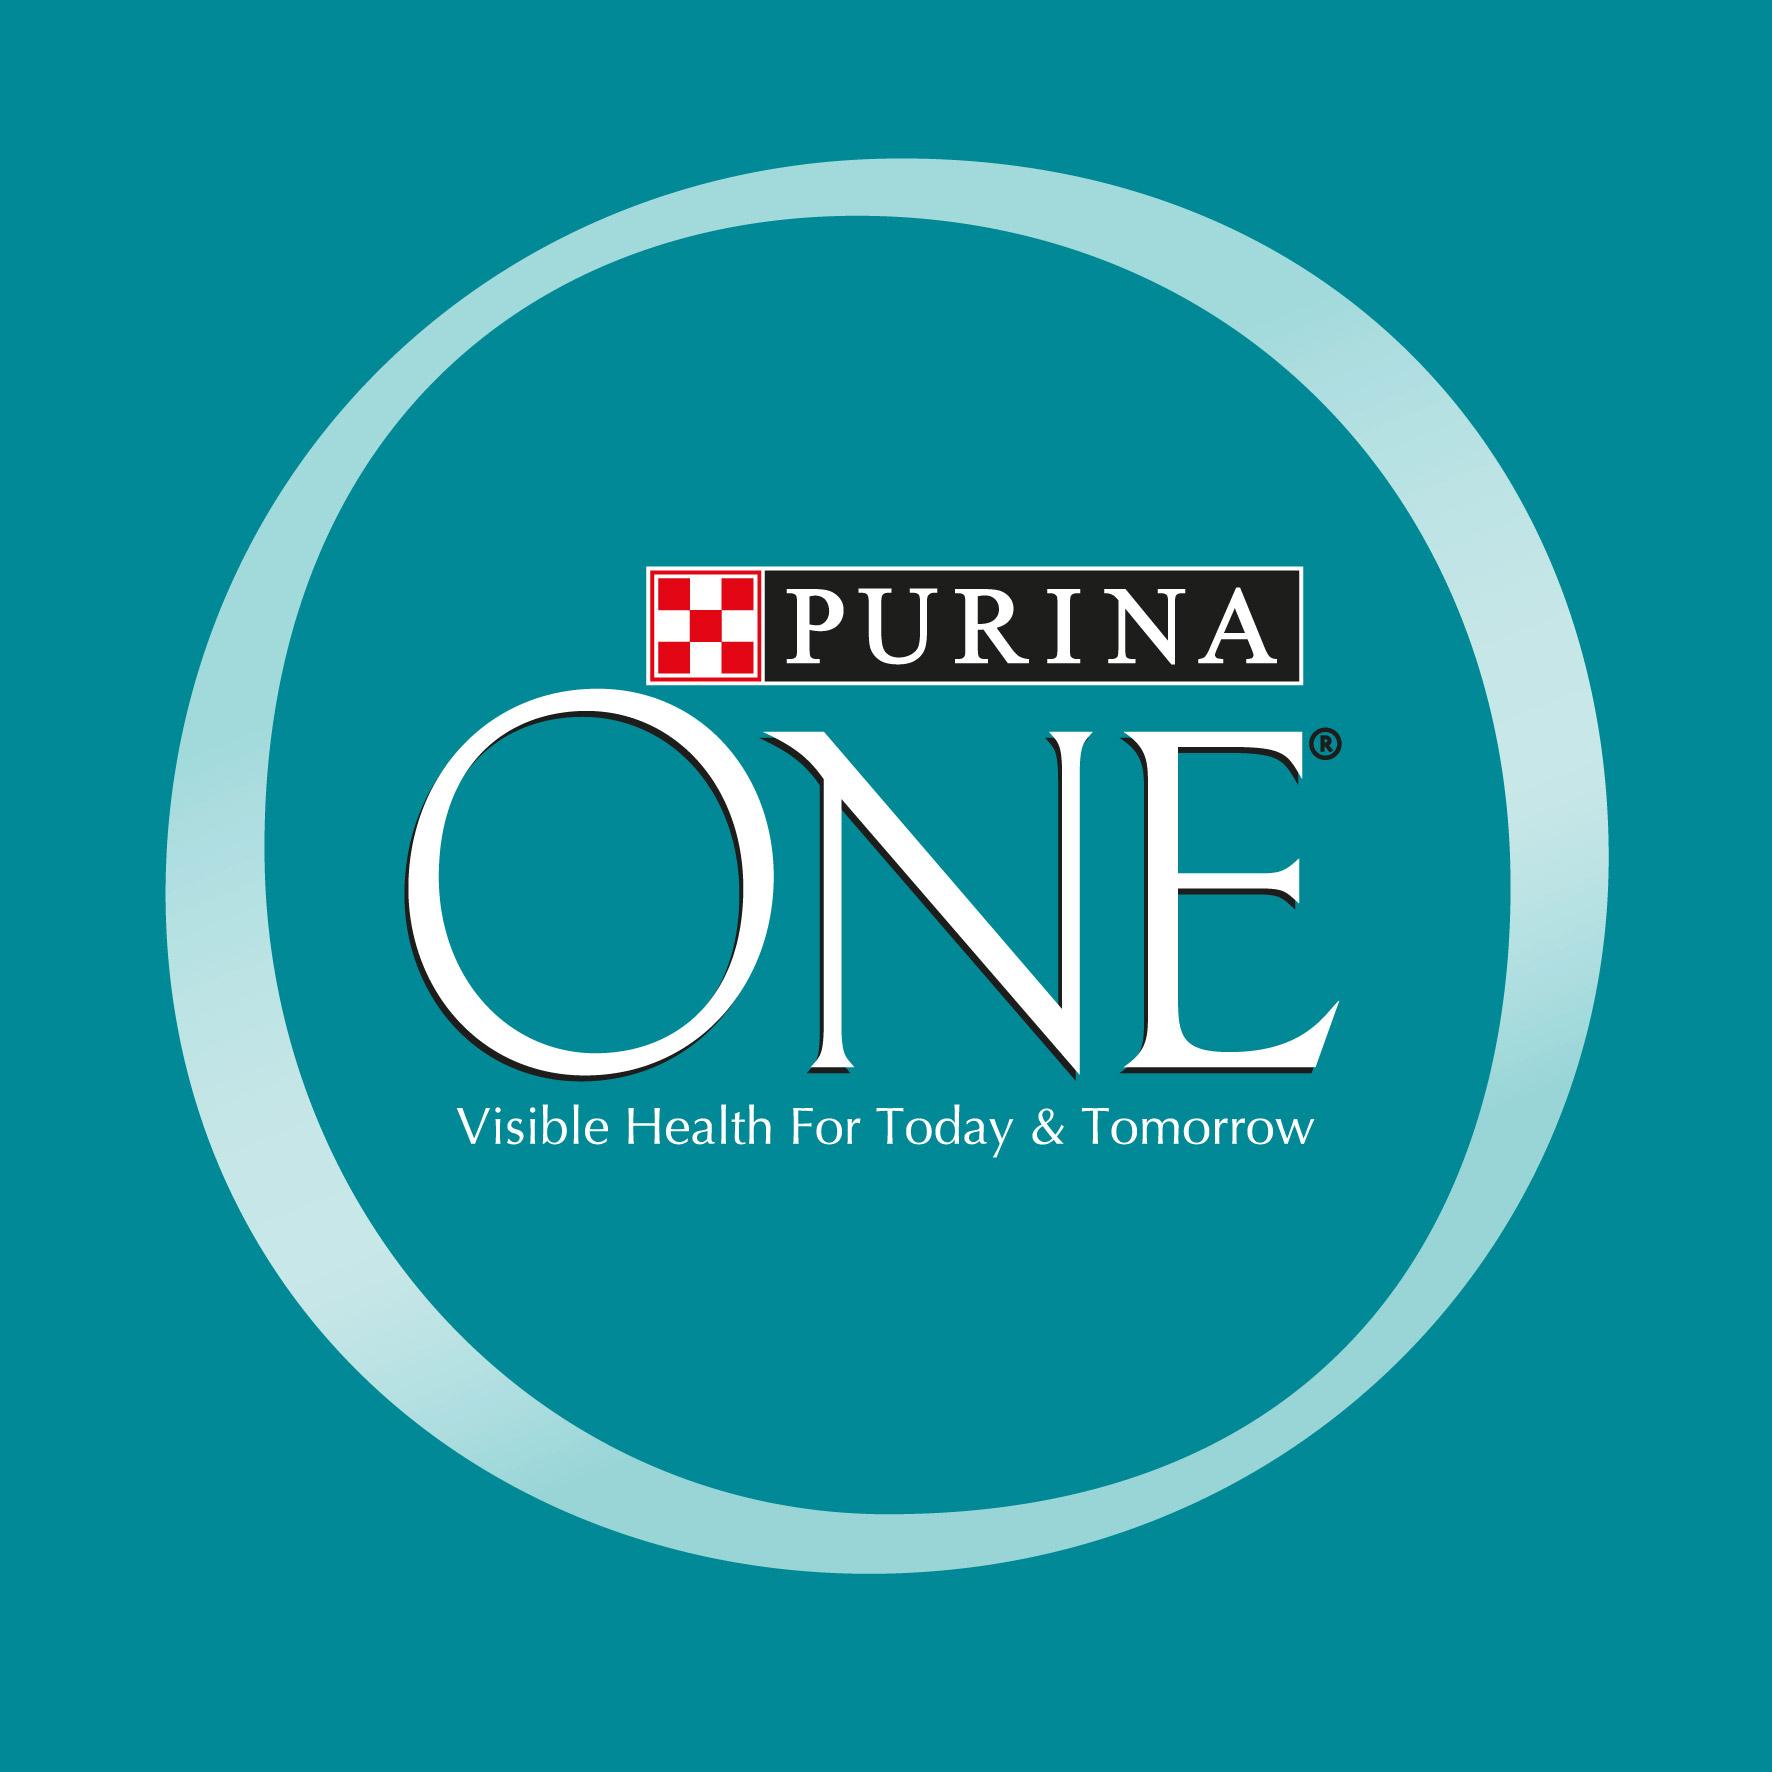 Purina_One logo_150 dpi_RGB.jpg